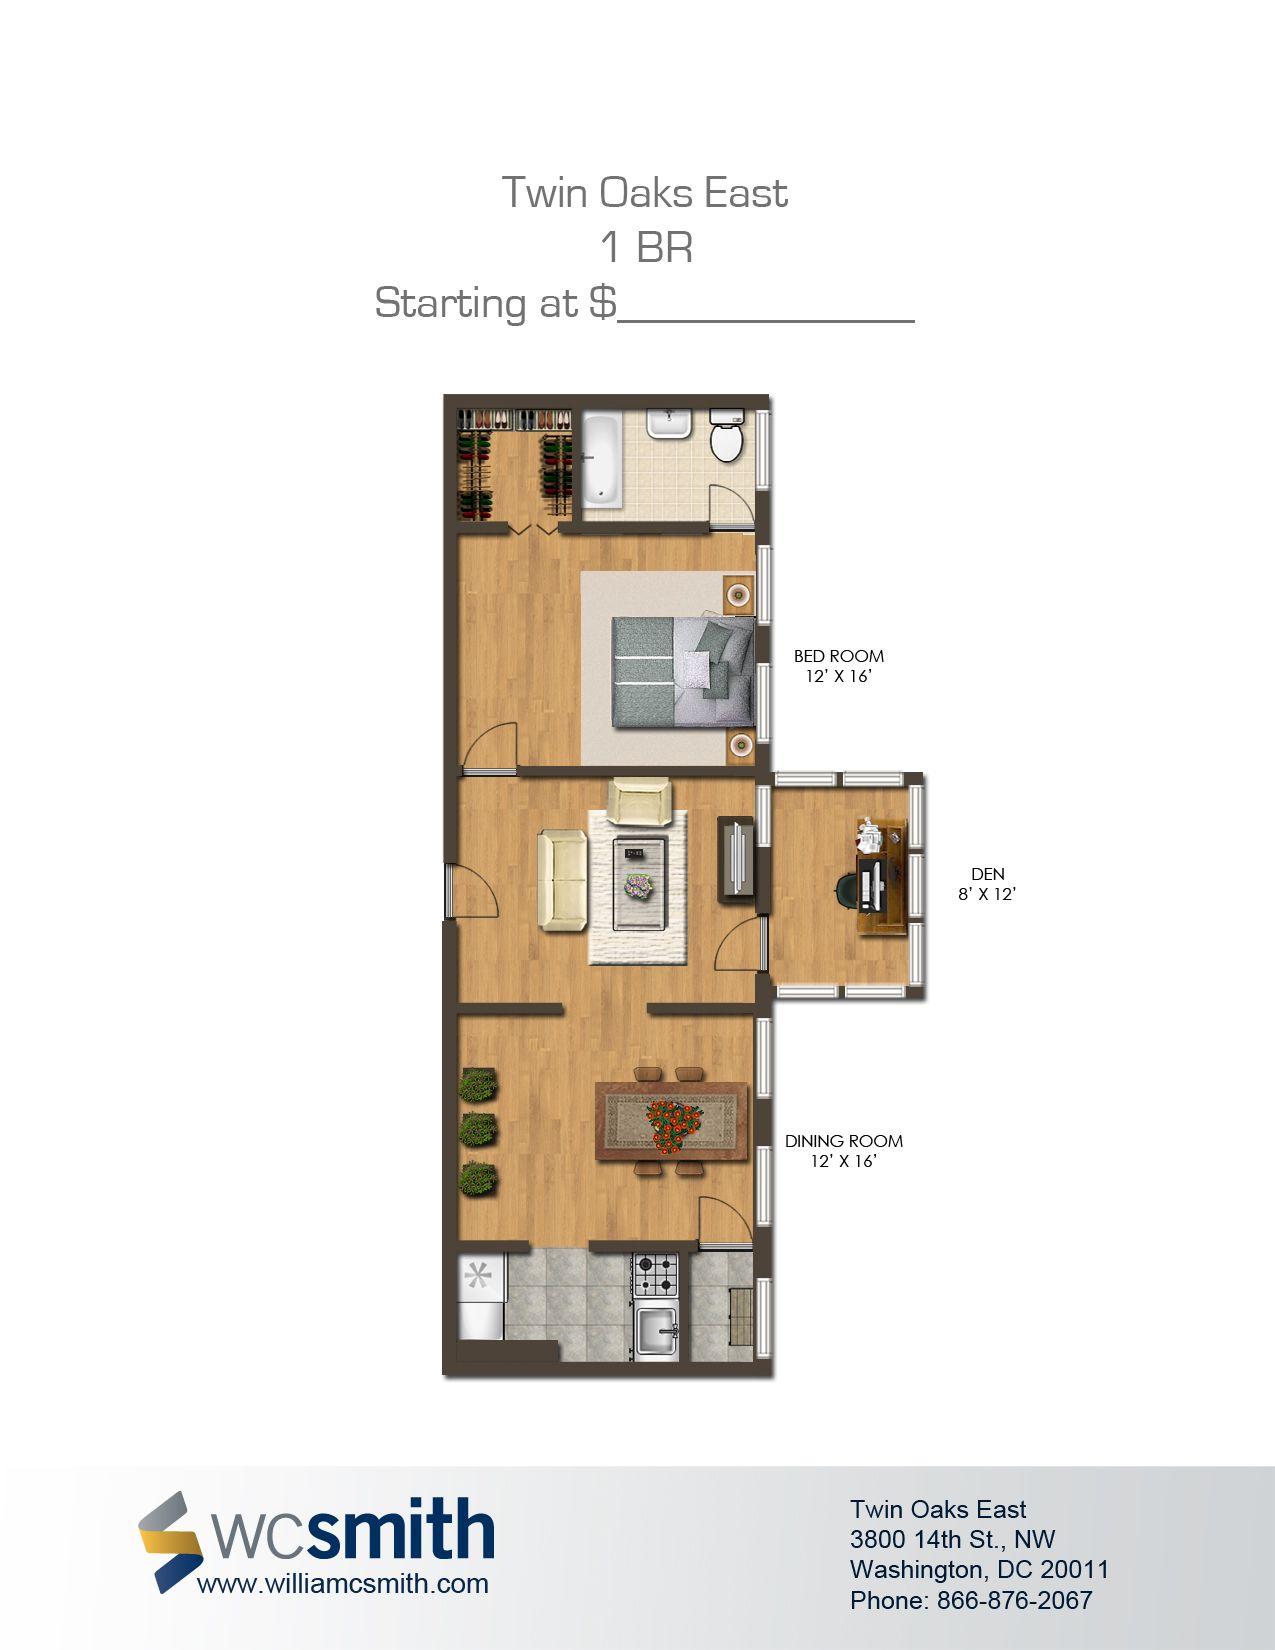 Twin oaks apartments bedroom floor plans twins and - Washington dc 1 bedroom apartments ...